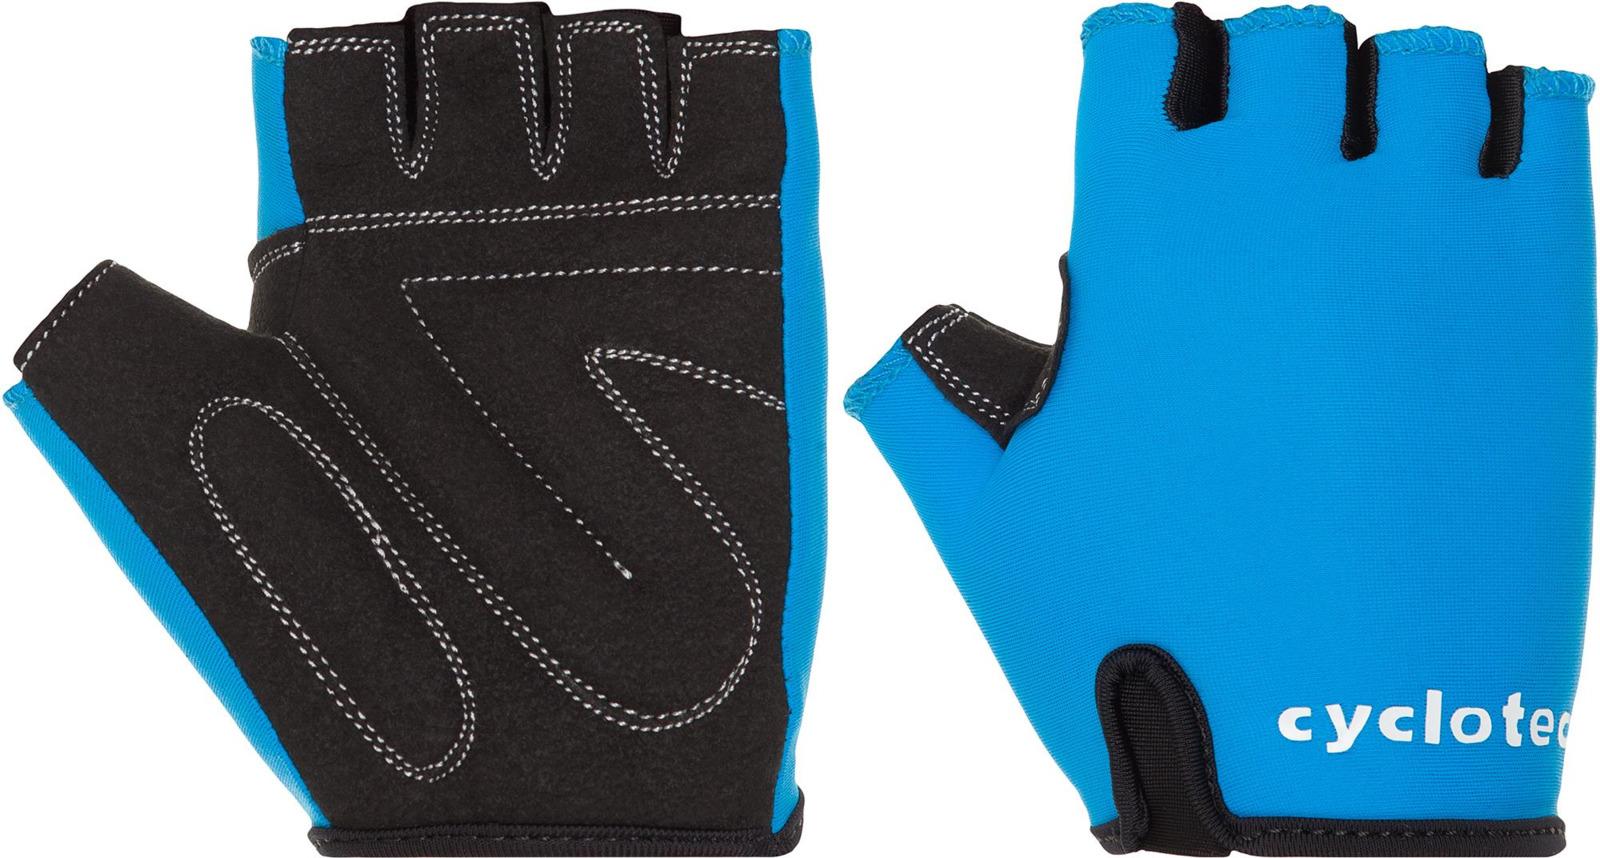 Велоперчатки Cyclotech WIND-B Bike gloves, синий, черный, размер S